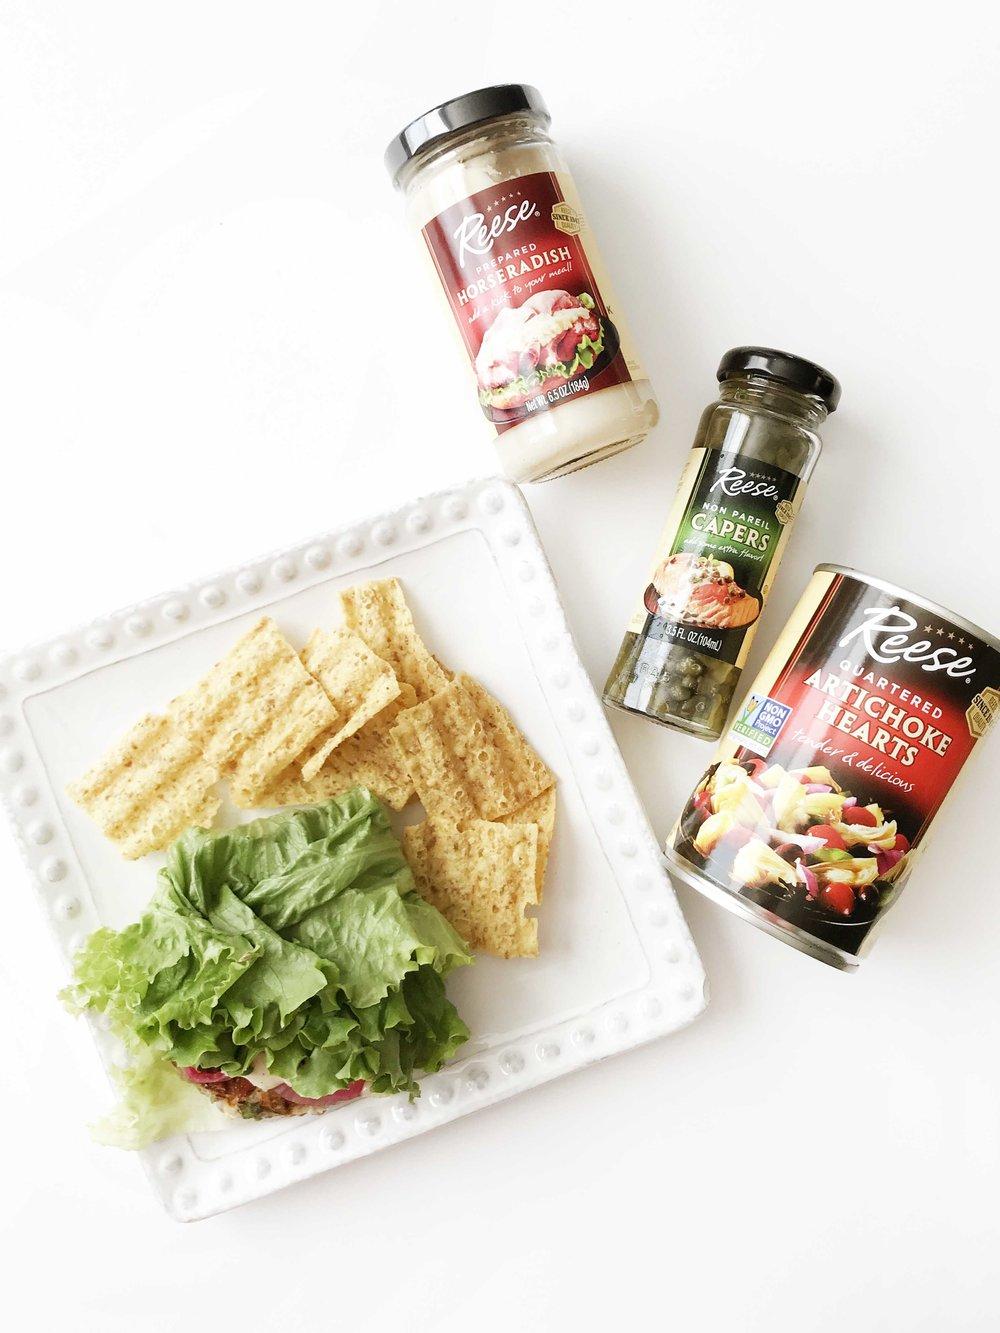 spinach-artichoke-burger12.jpg